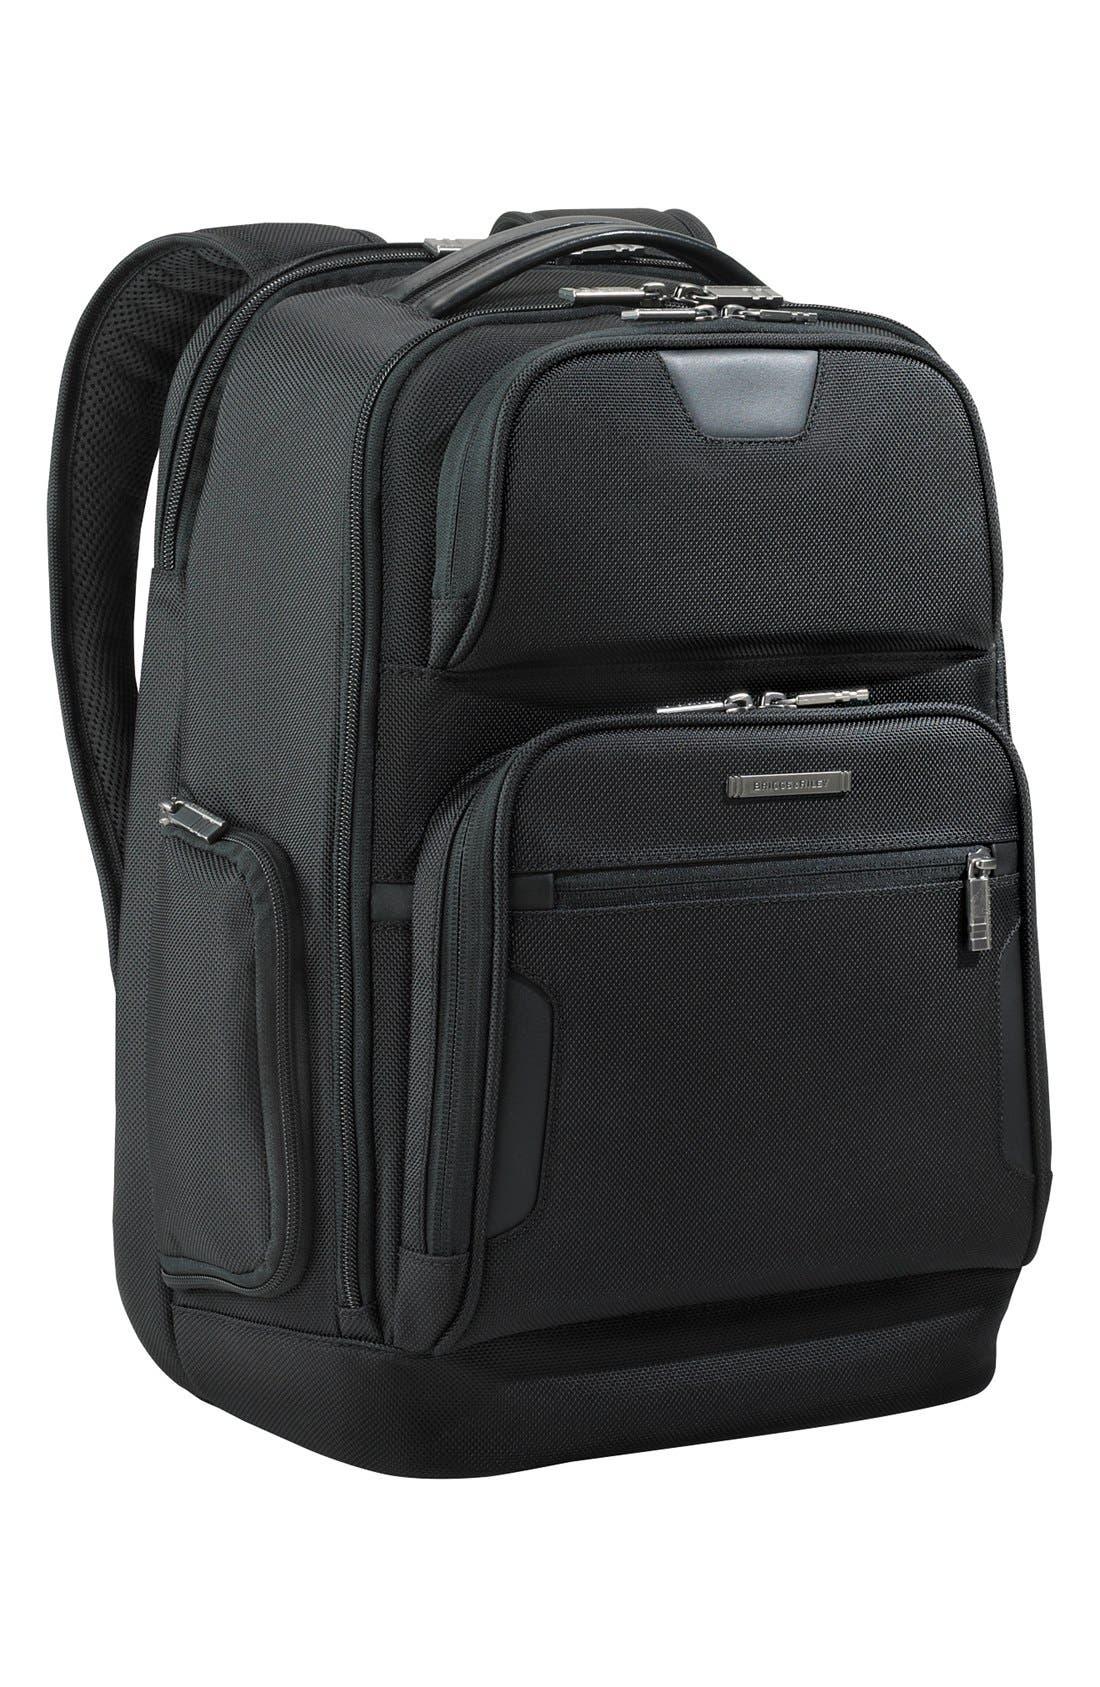 Medium Ballistic Nylon Backpack,                             Main thumbnail 1, color,